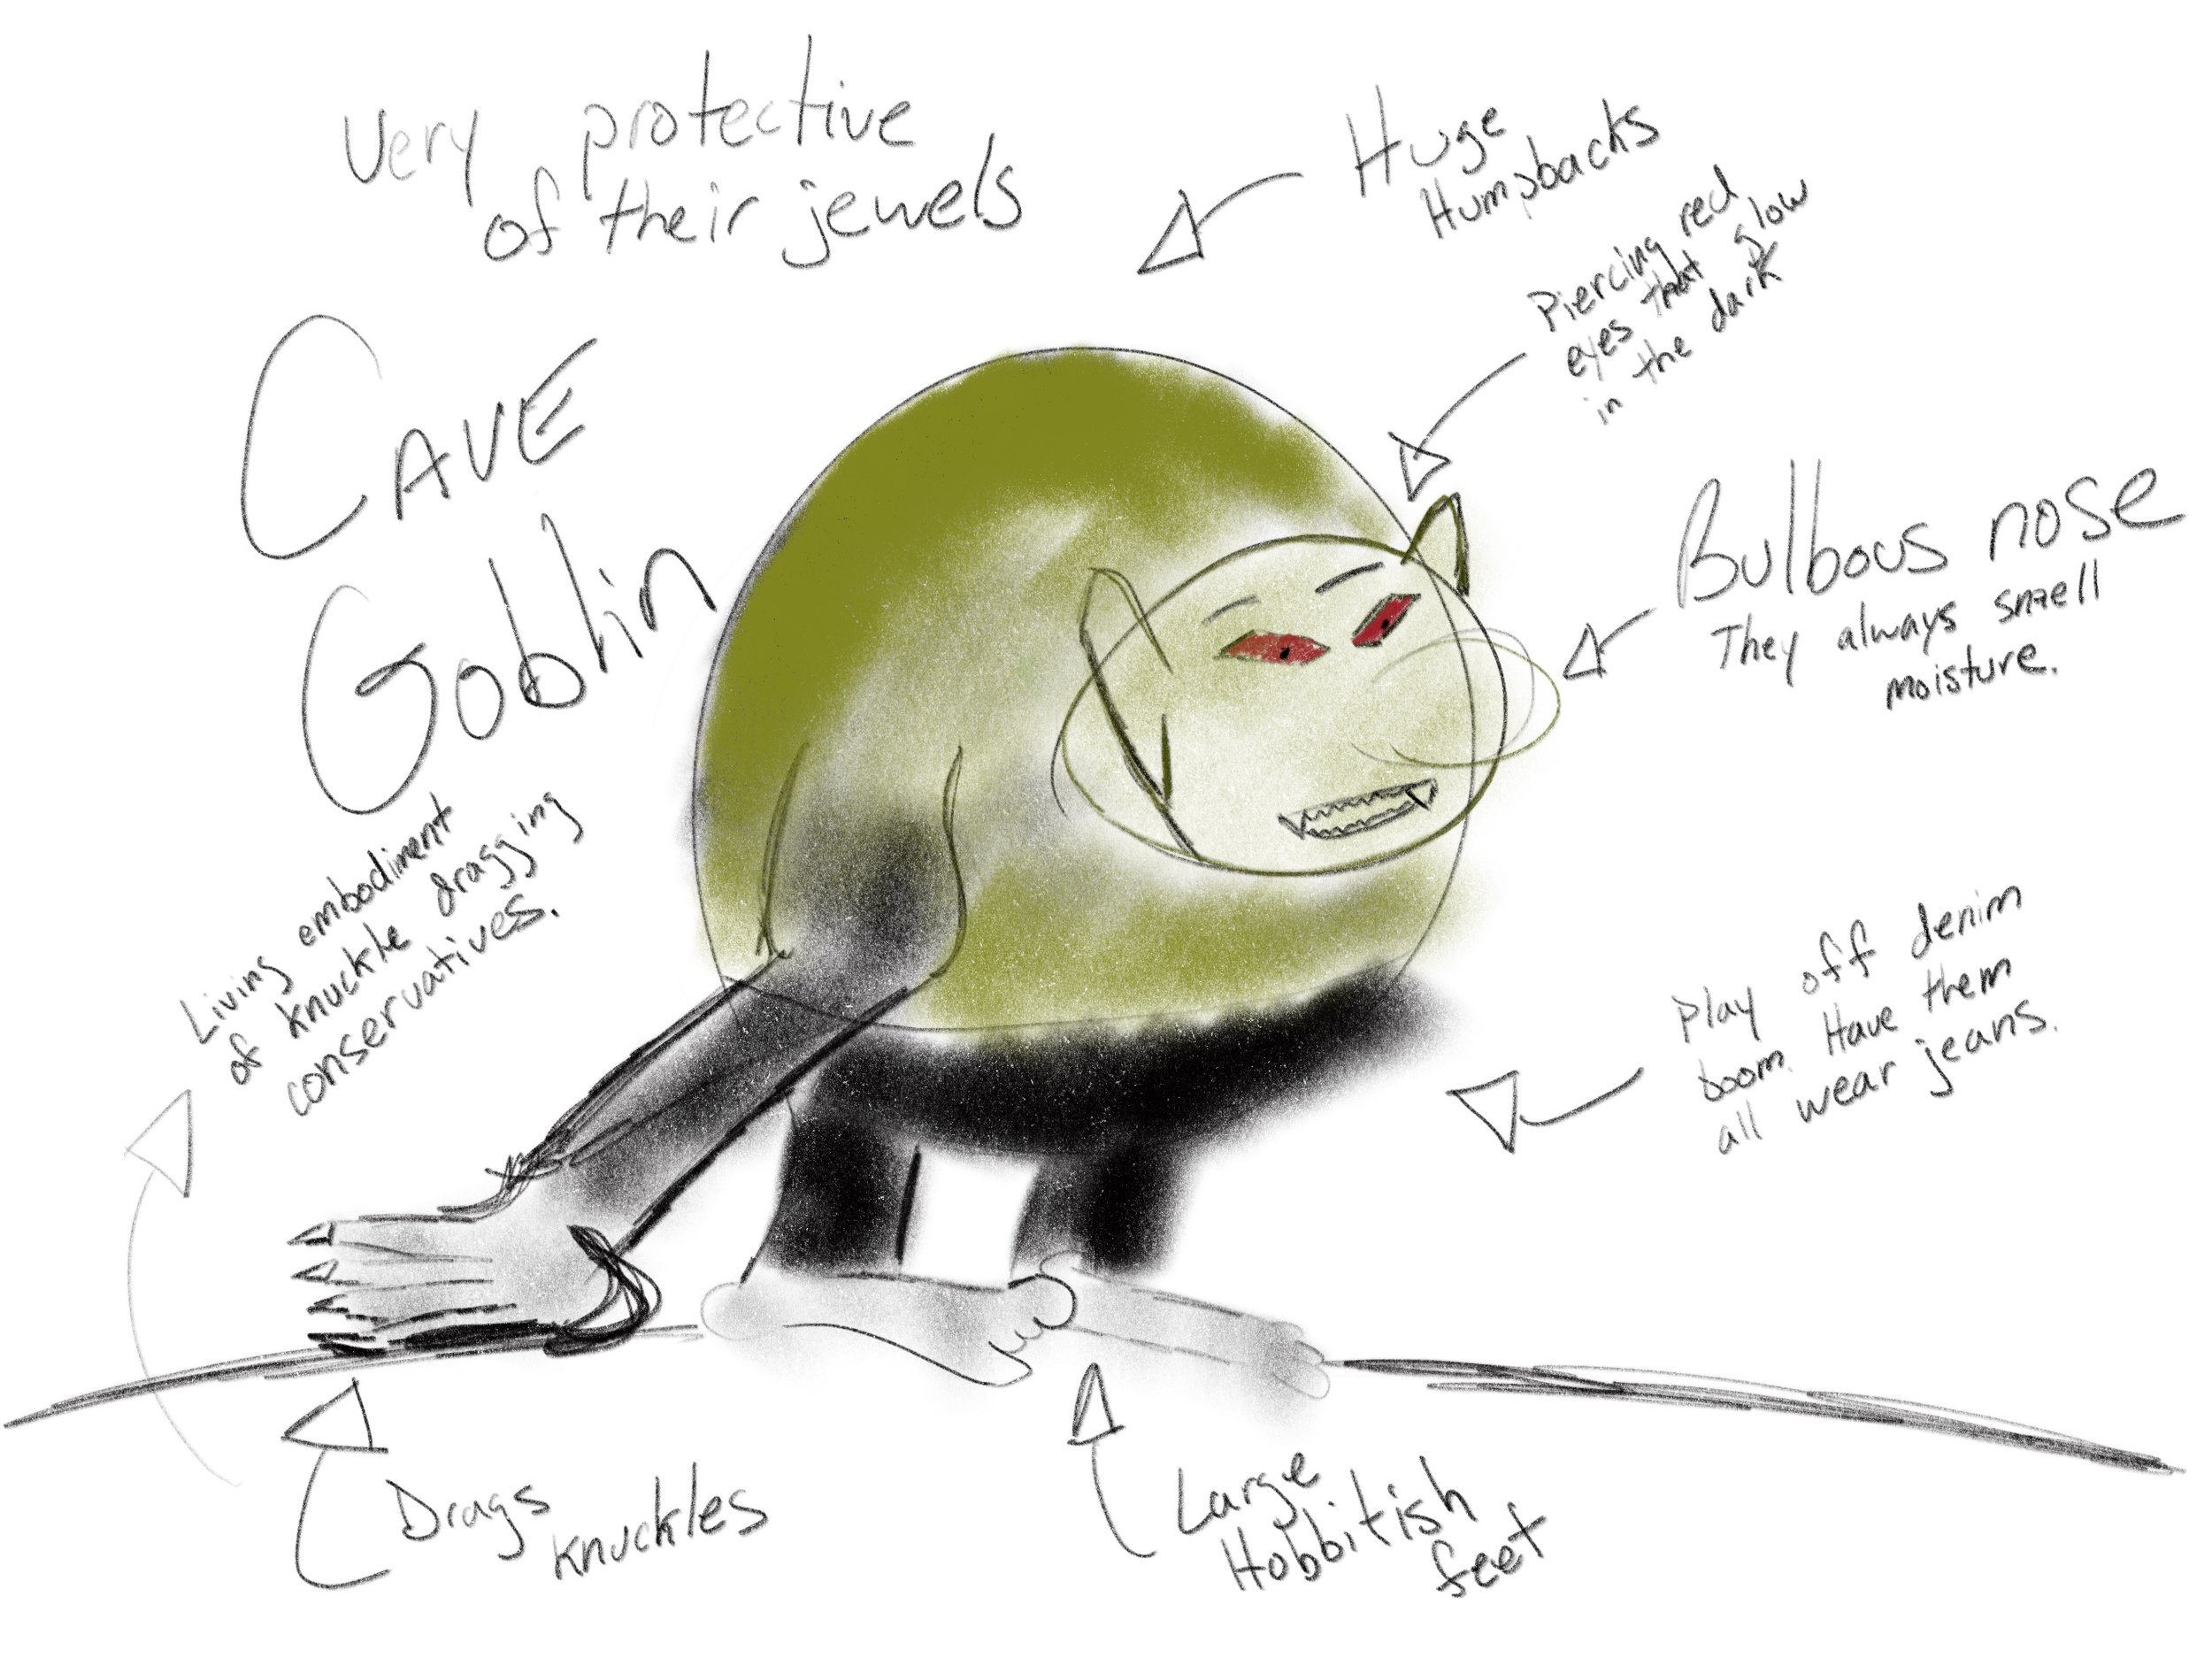 Cave_Goblin.jpg